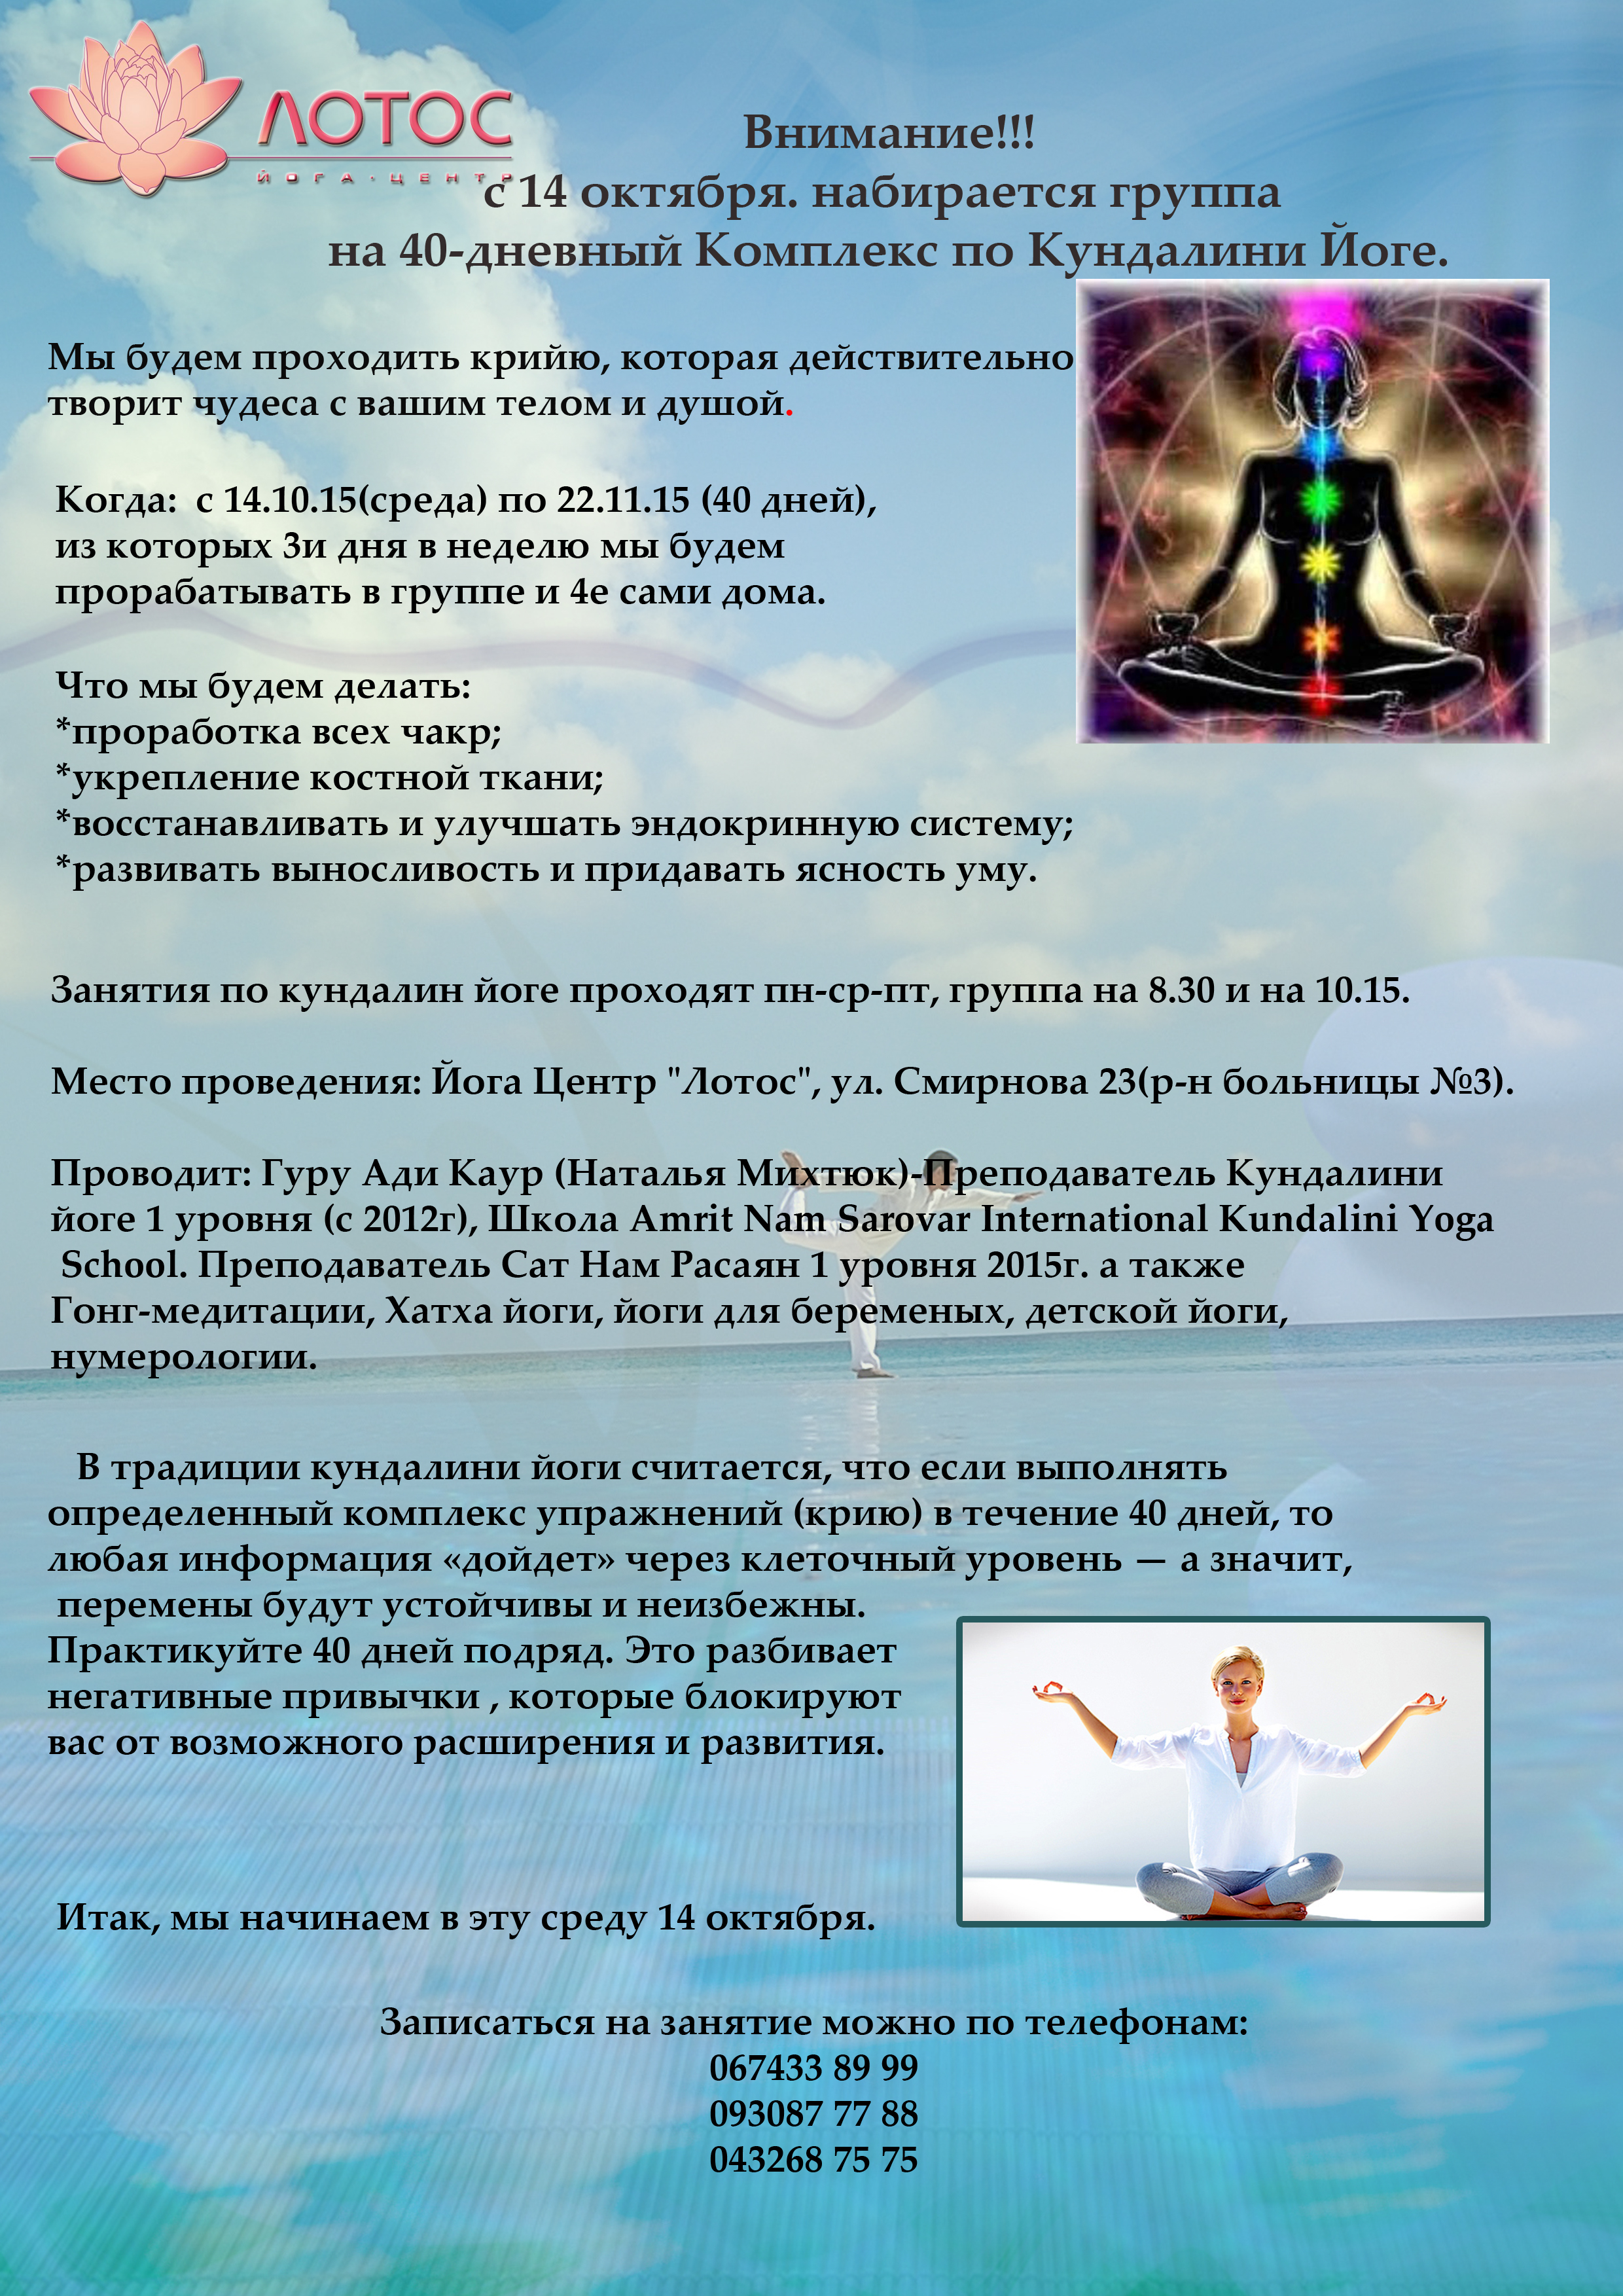 Как вам поможет кундалини йога?